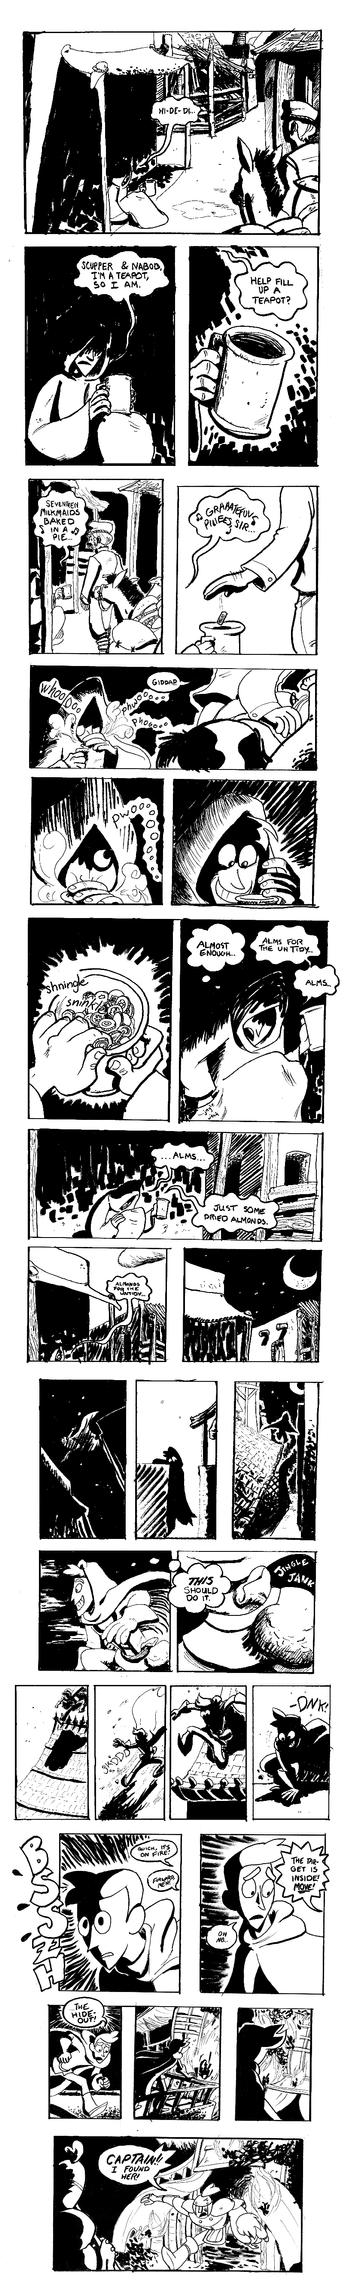 Precious Metal Issue 2 -1 by animatrix1490